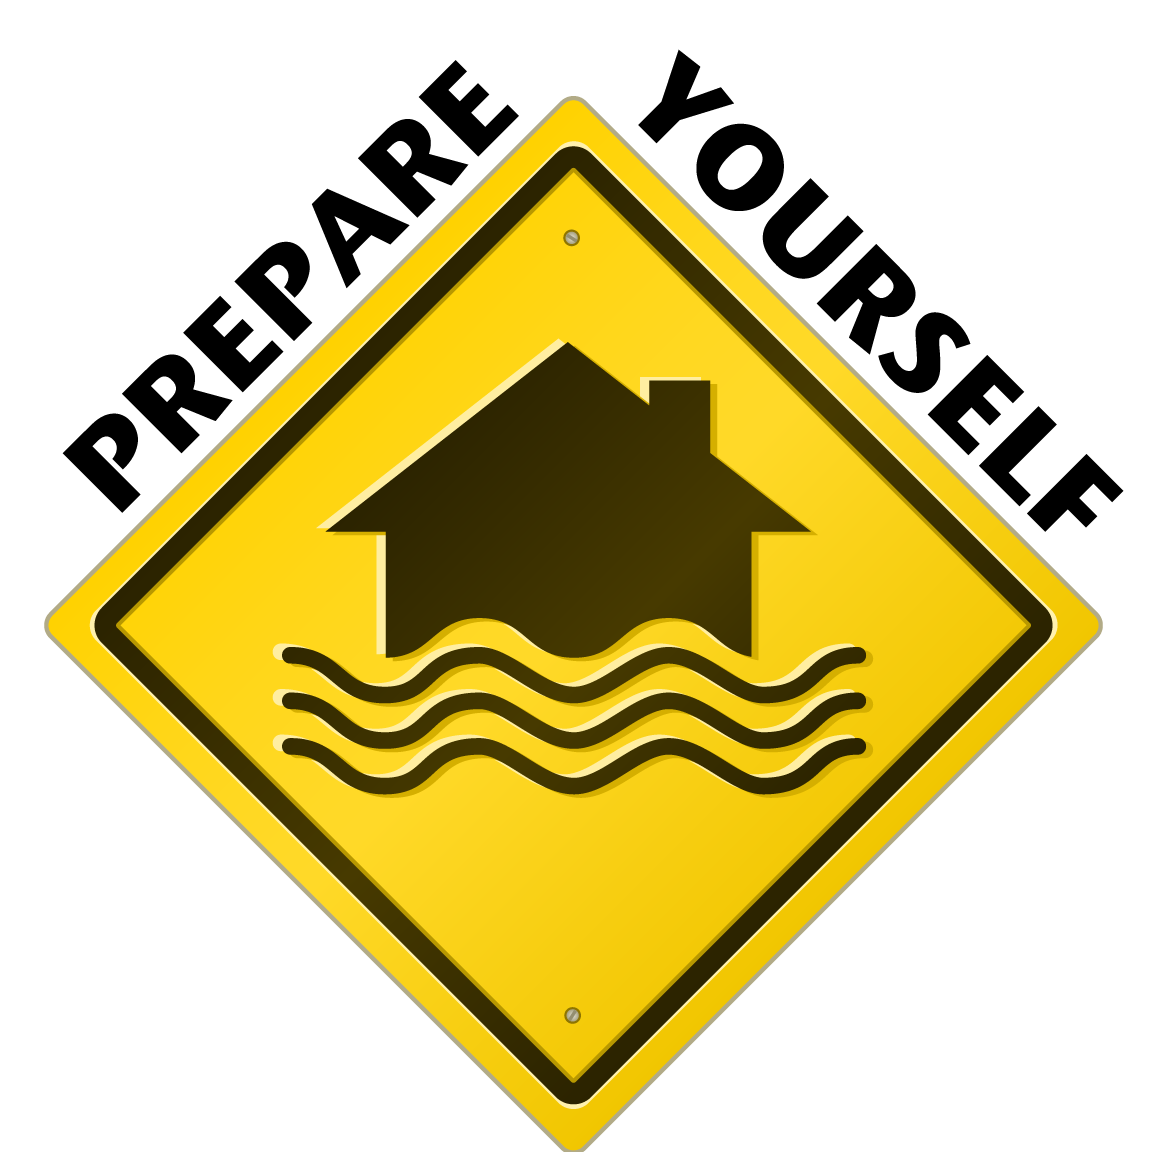 Clipart ocean flood. Png transparent images all